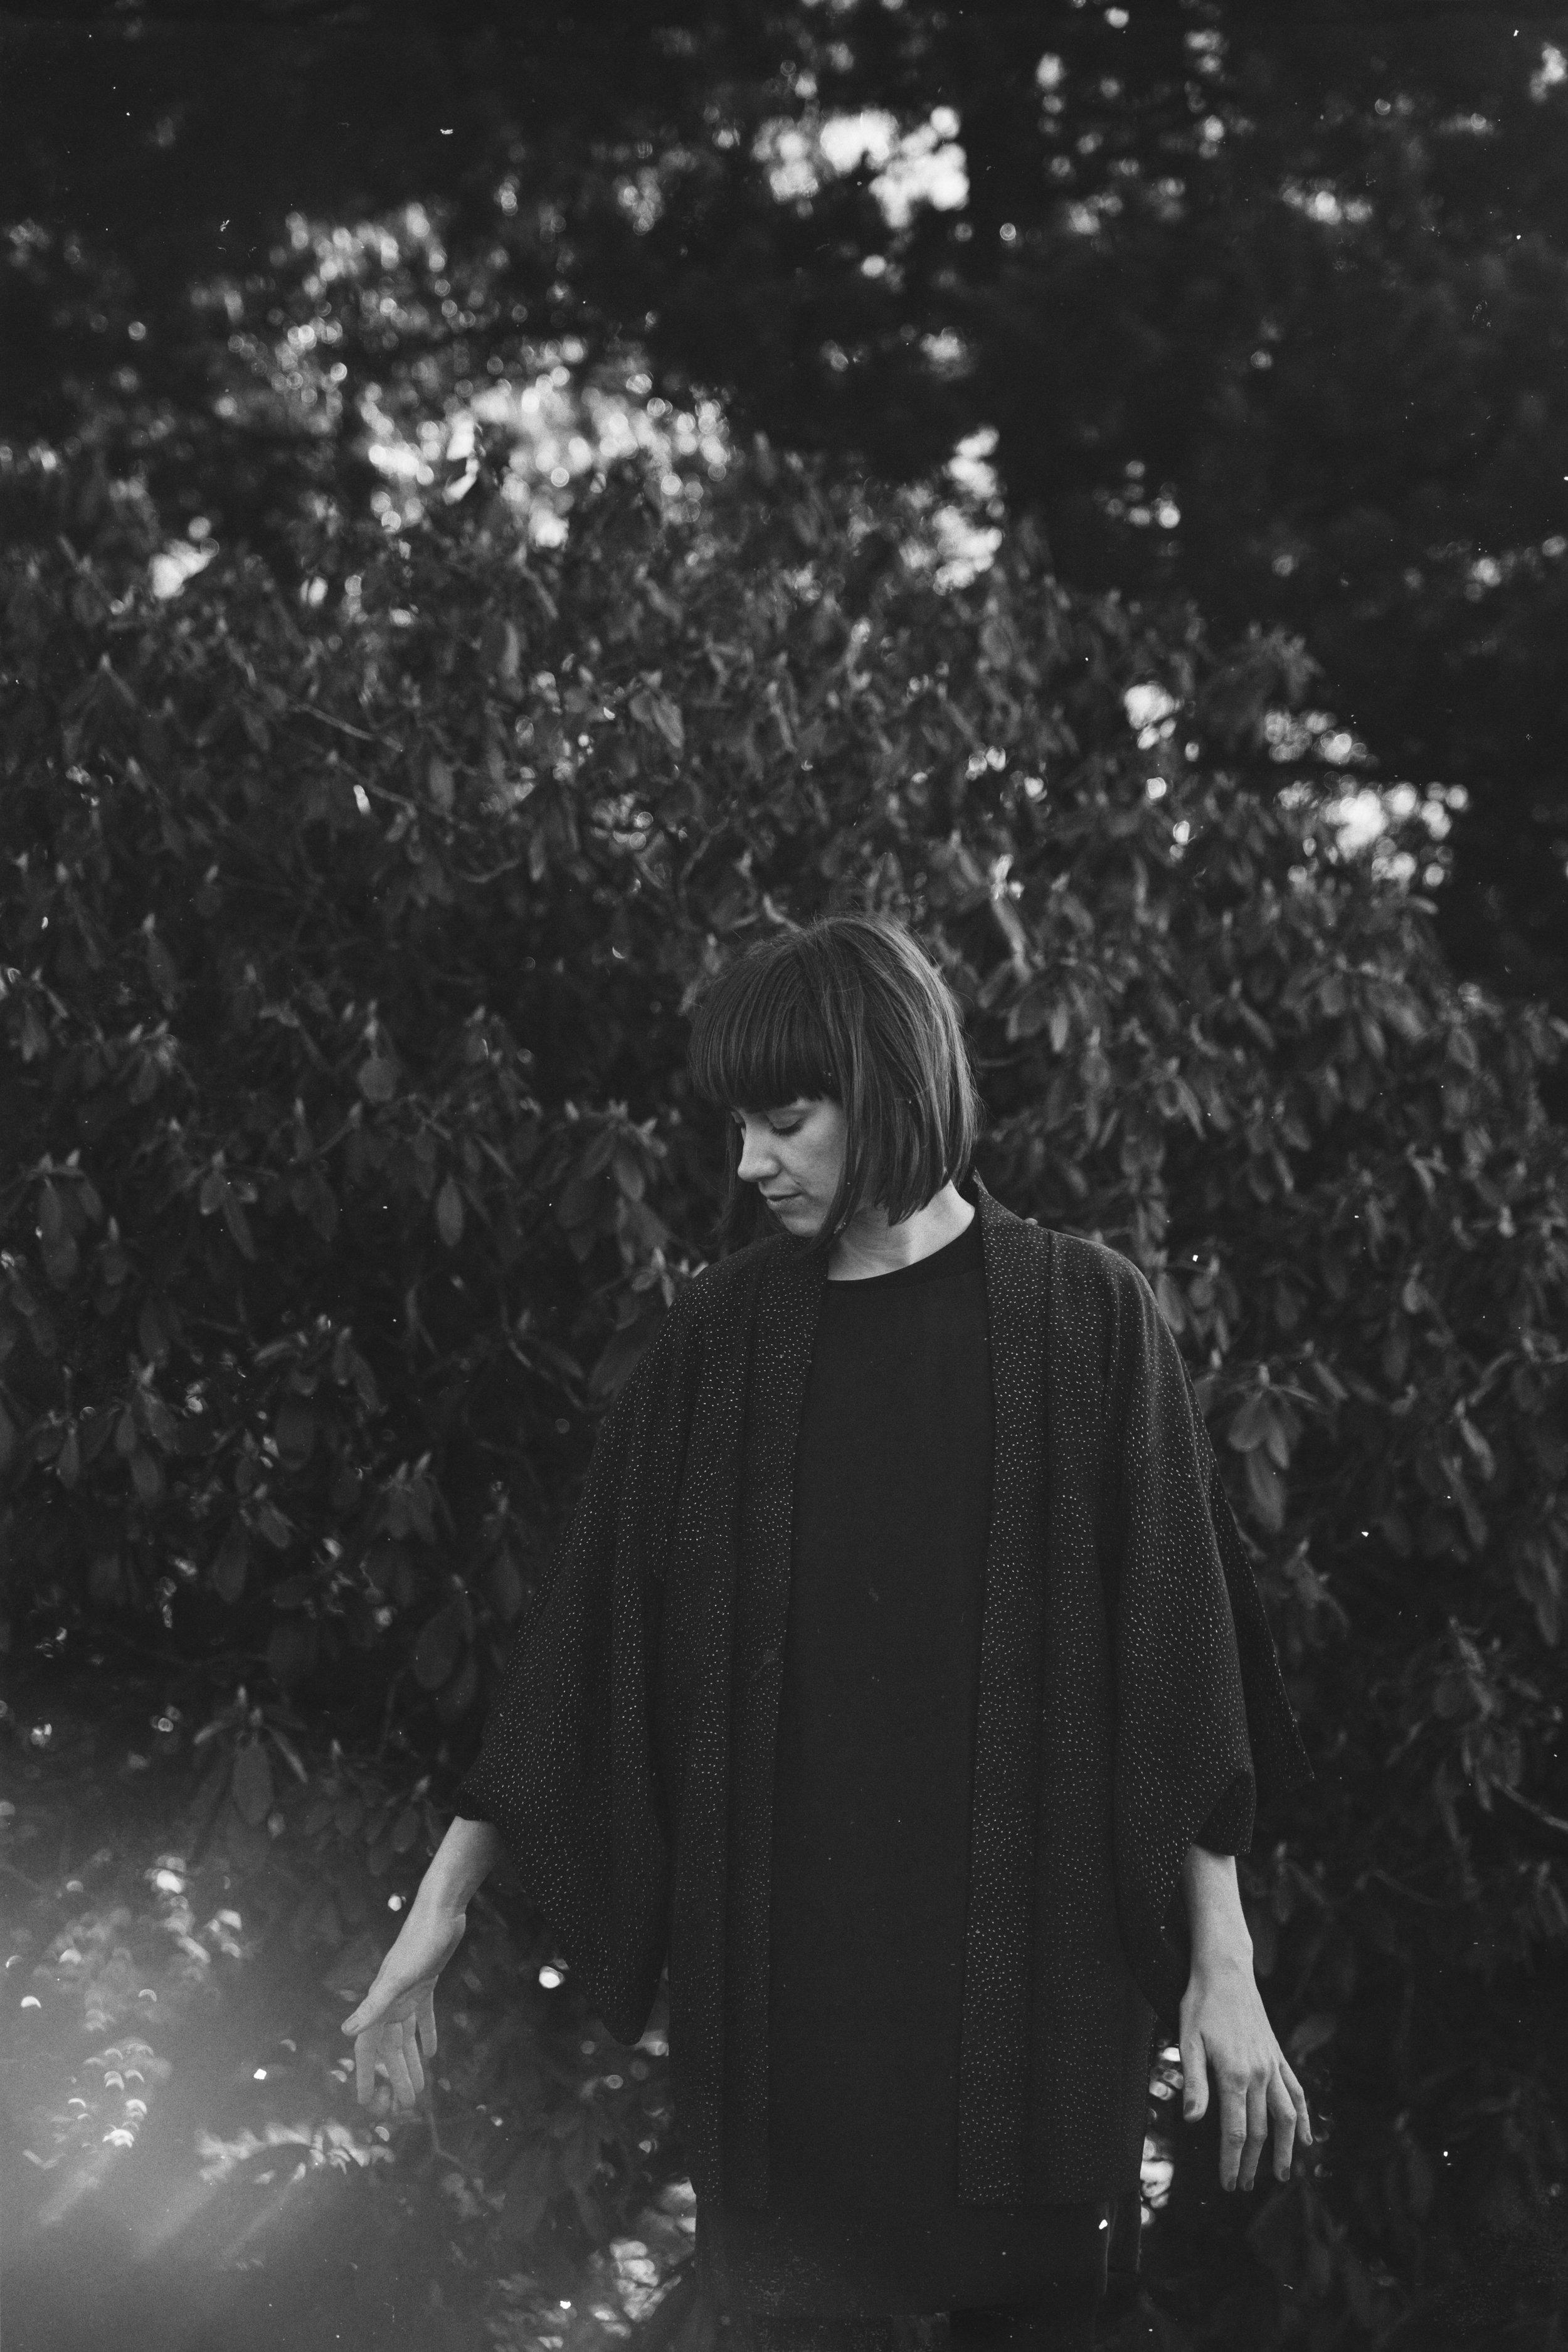 PHOTO: SARA ANGELICA SPILLING